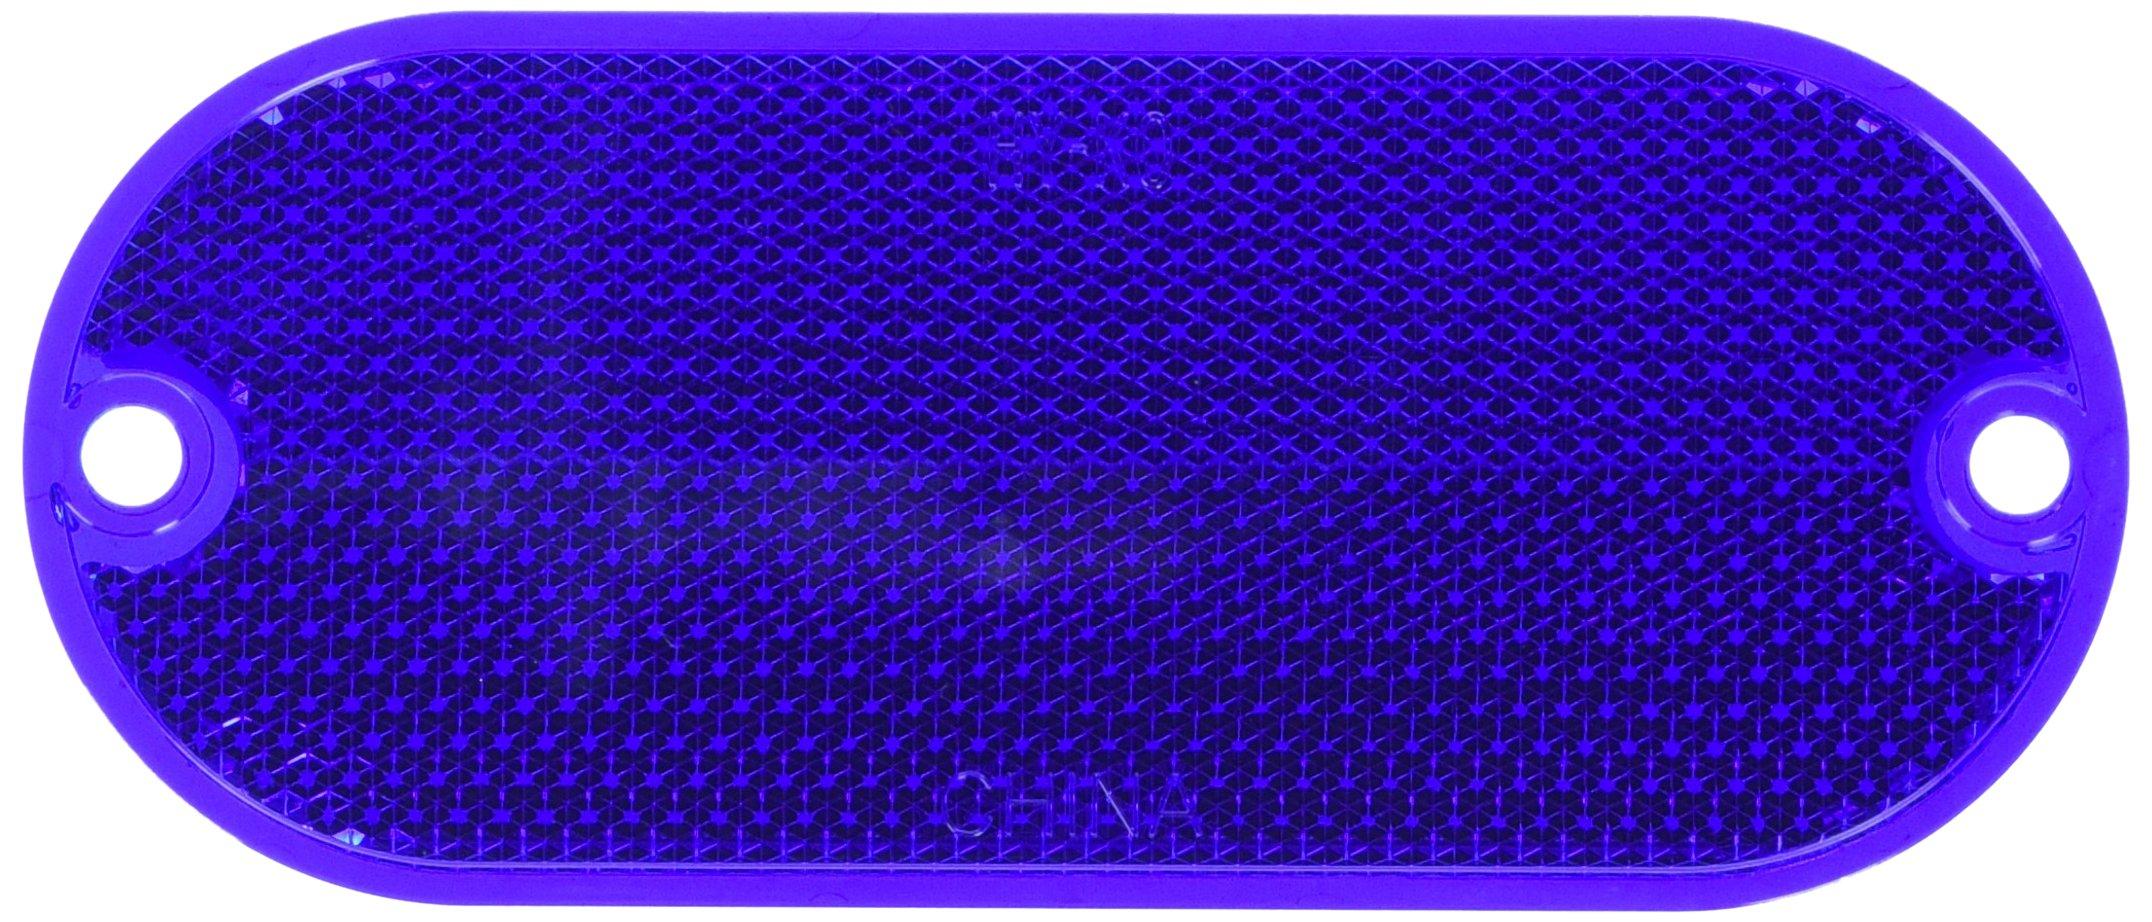 HY-KO PROD Oval Reflector, 2 Pack, 4-3/8'', Blue (CORB-7B)